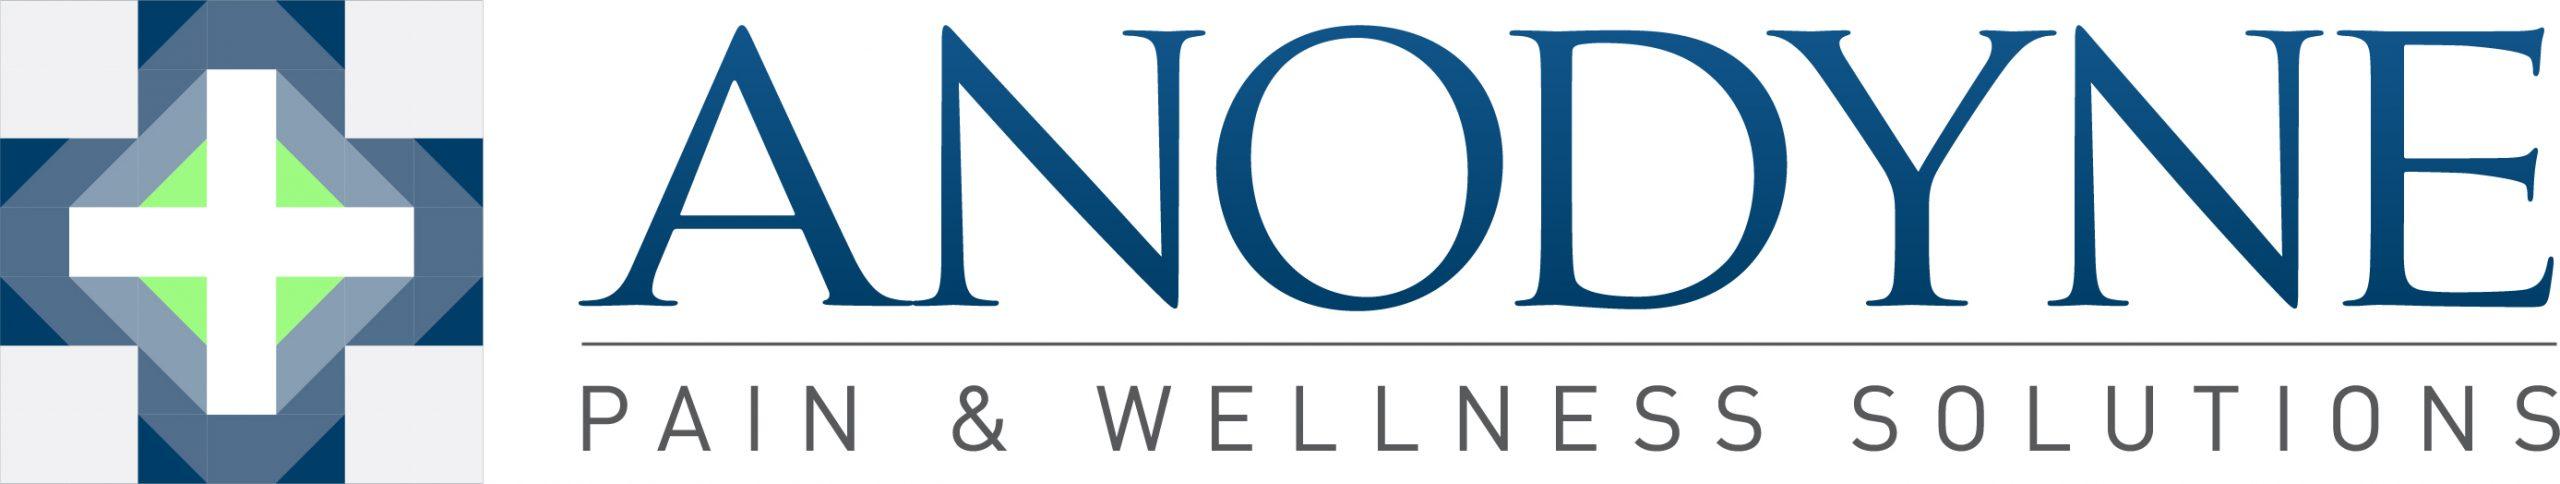 anodyne pain & wellness